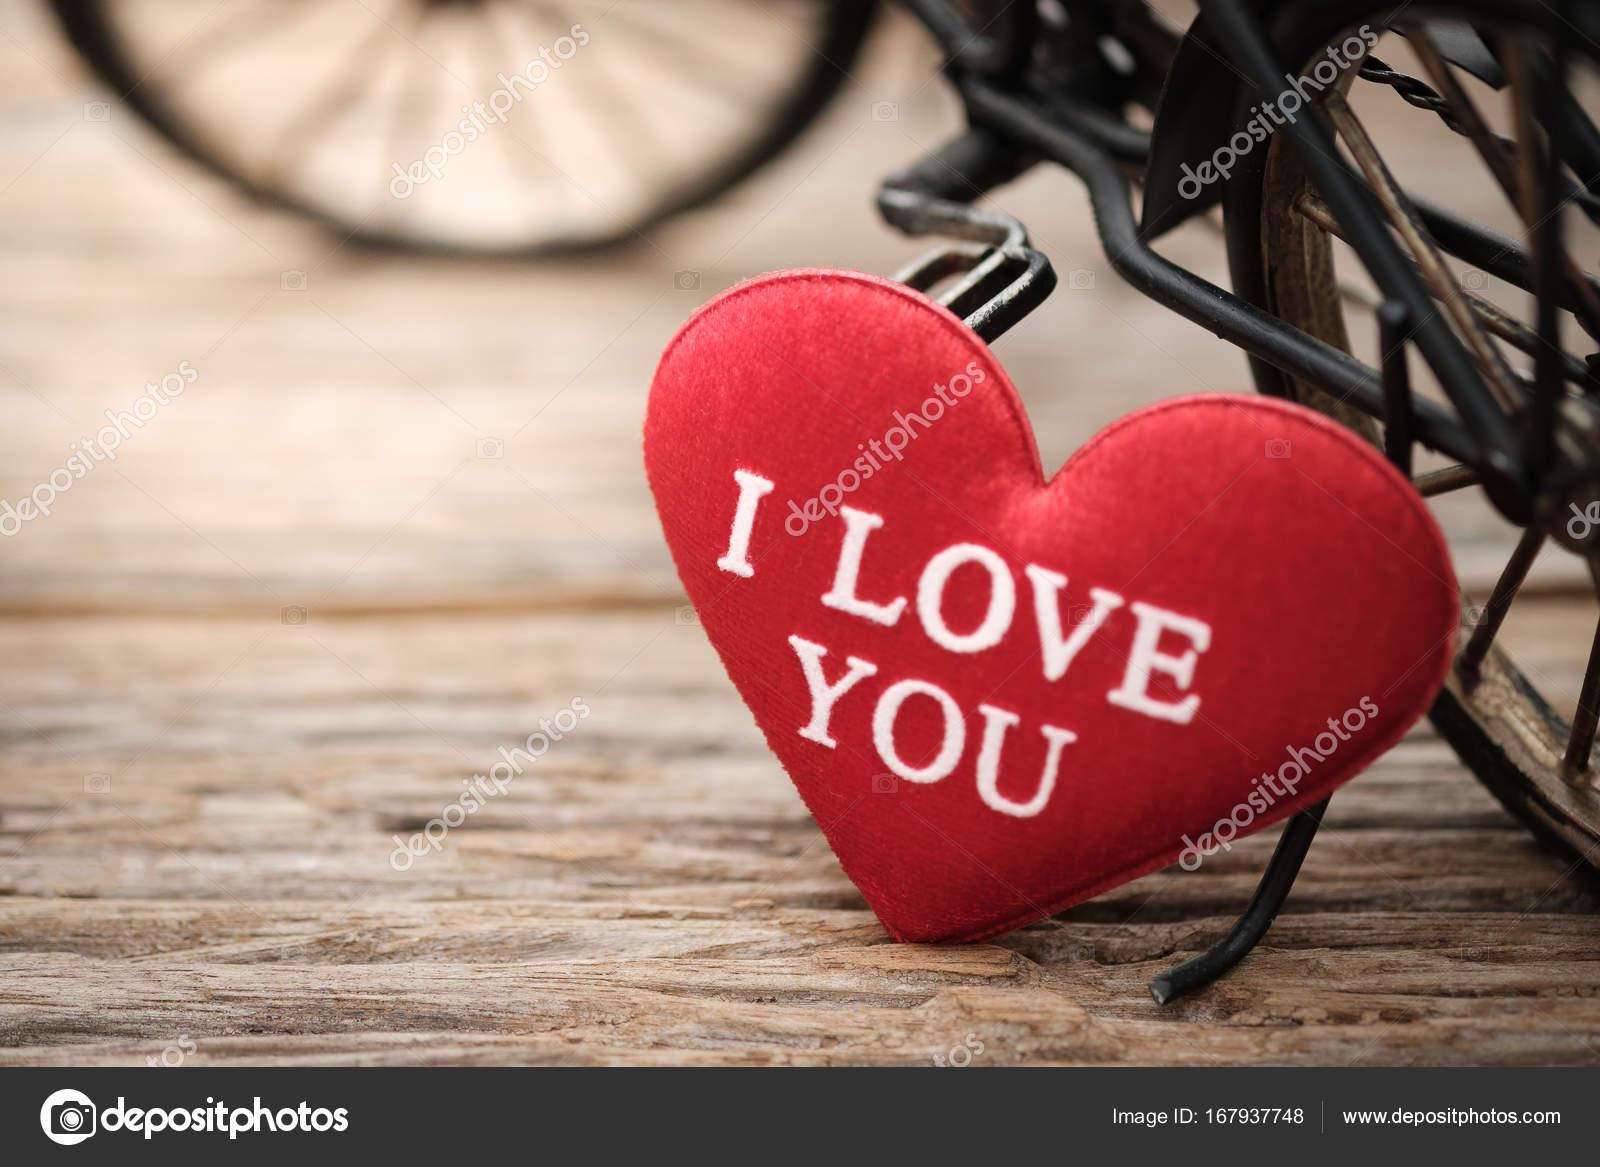 3944cced9e5a2 Forma de corazón rojo almohada y bicicleta de juguete en madera fondo con  espacio para escribir. Concepto de San Valentín